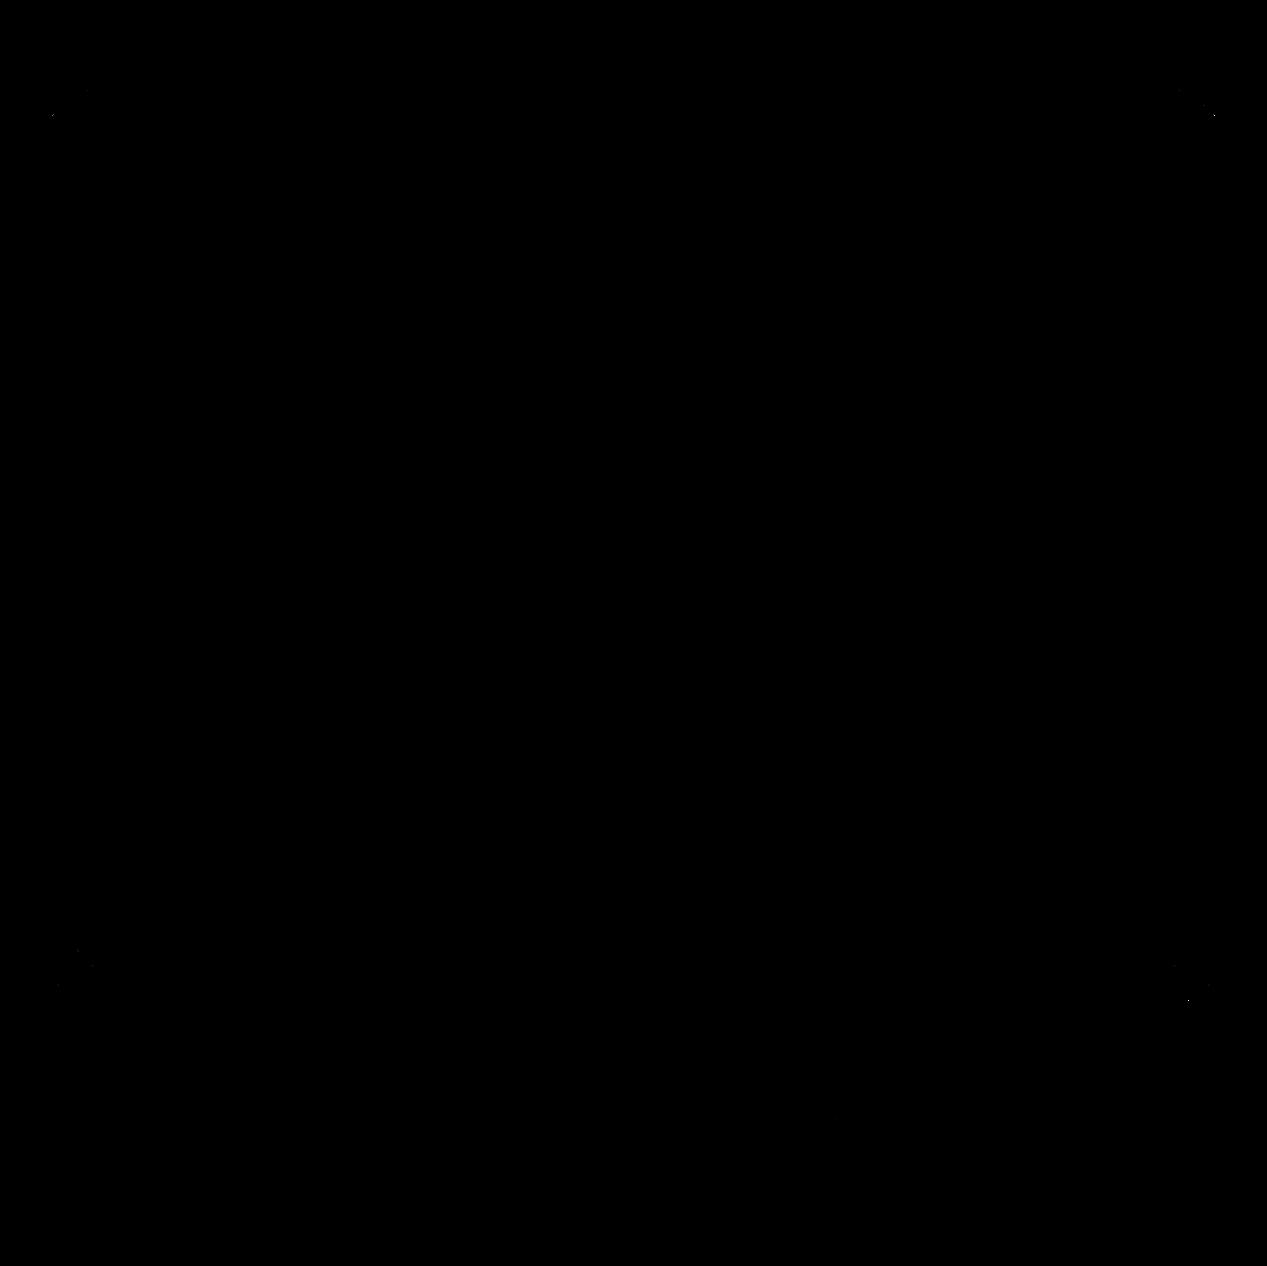 icon covregister